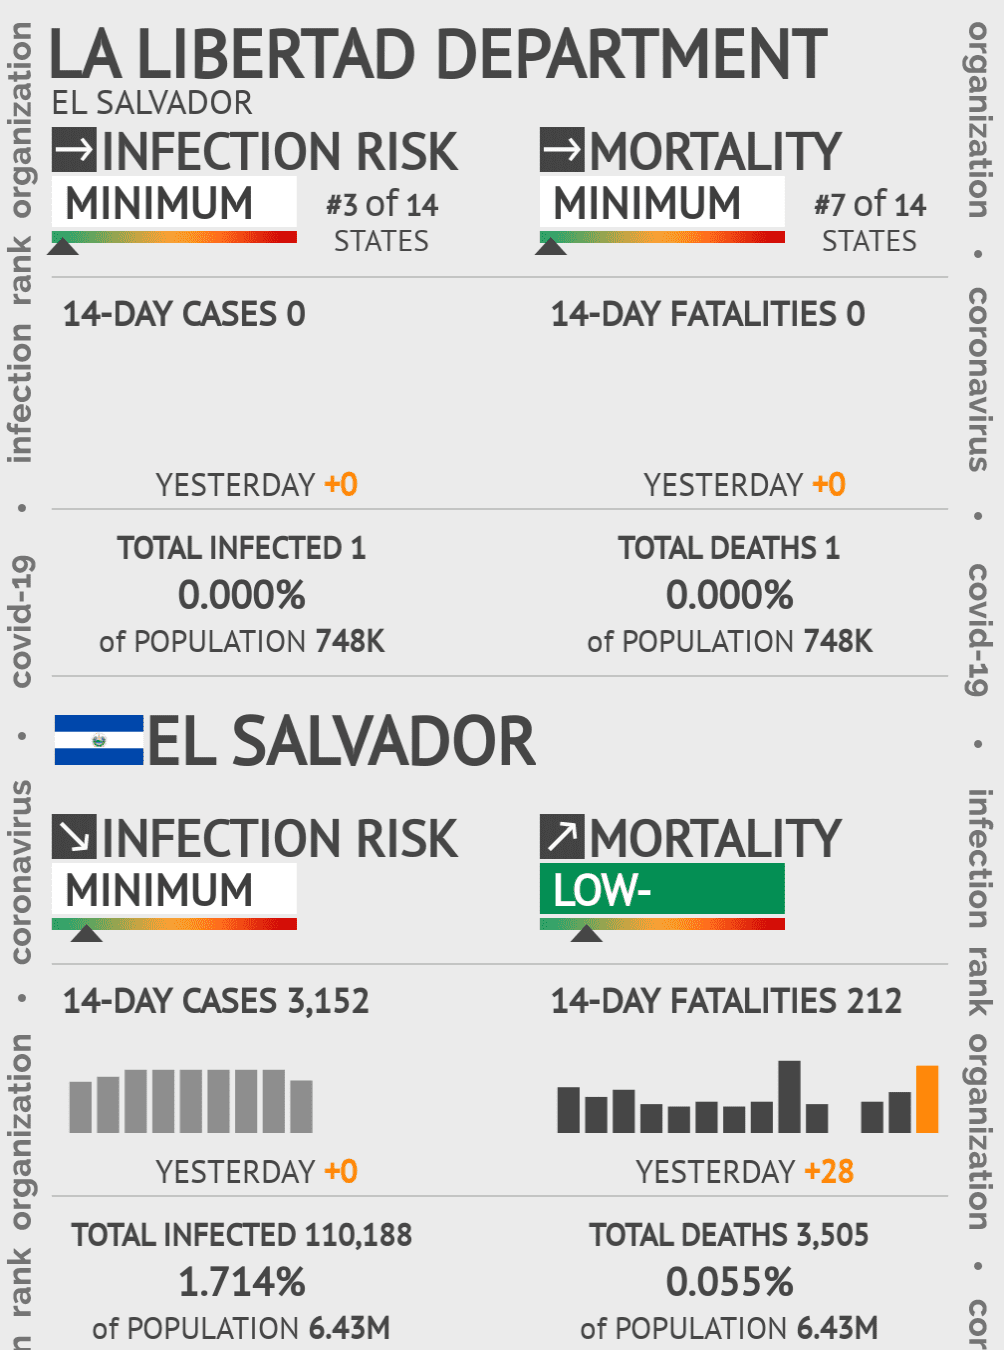 La Libertad Coronavirus Covid-19 Risk of Infection on December 10, 2020